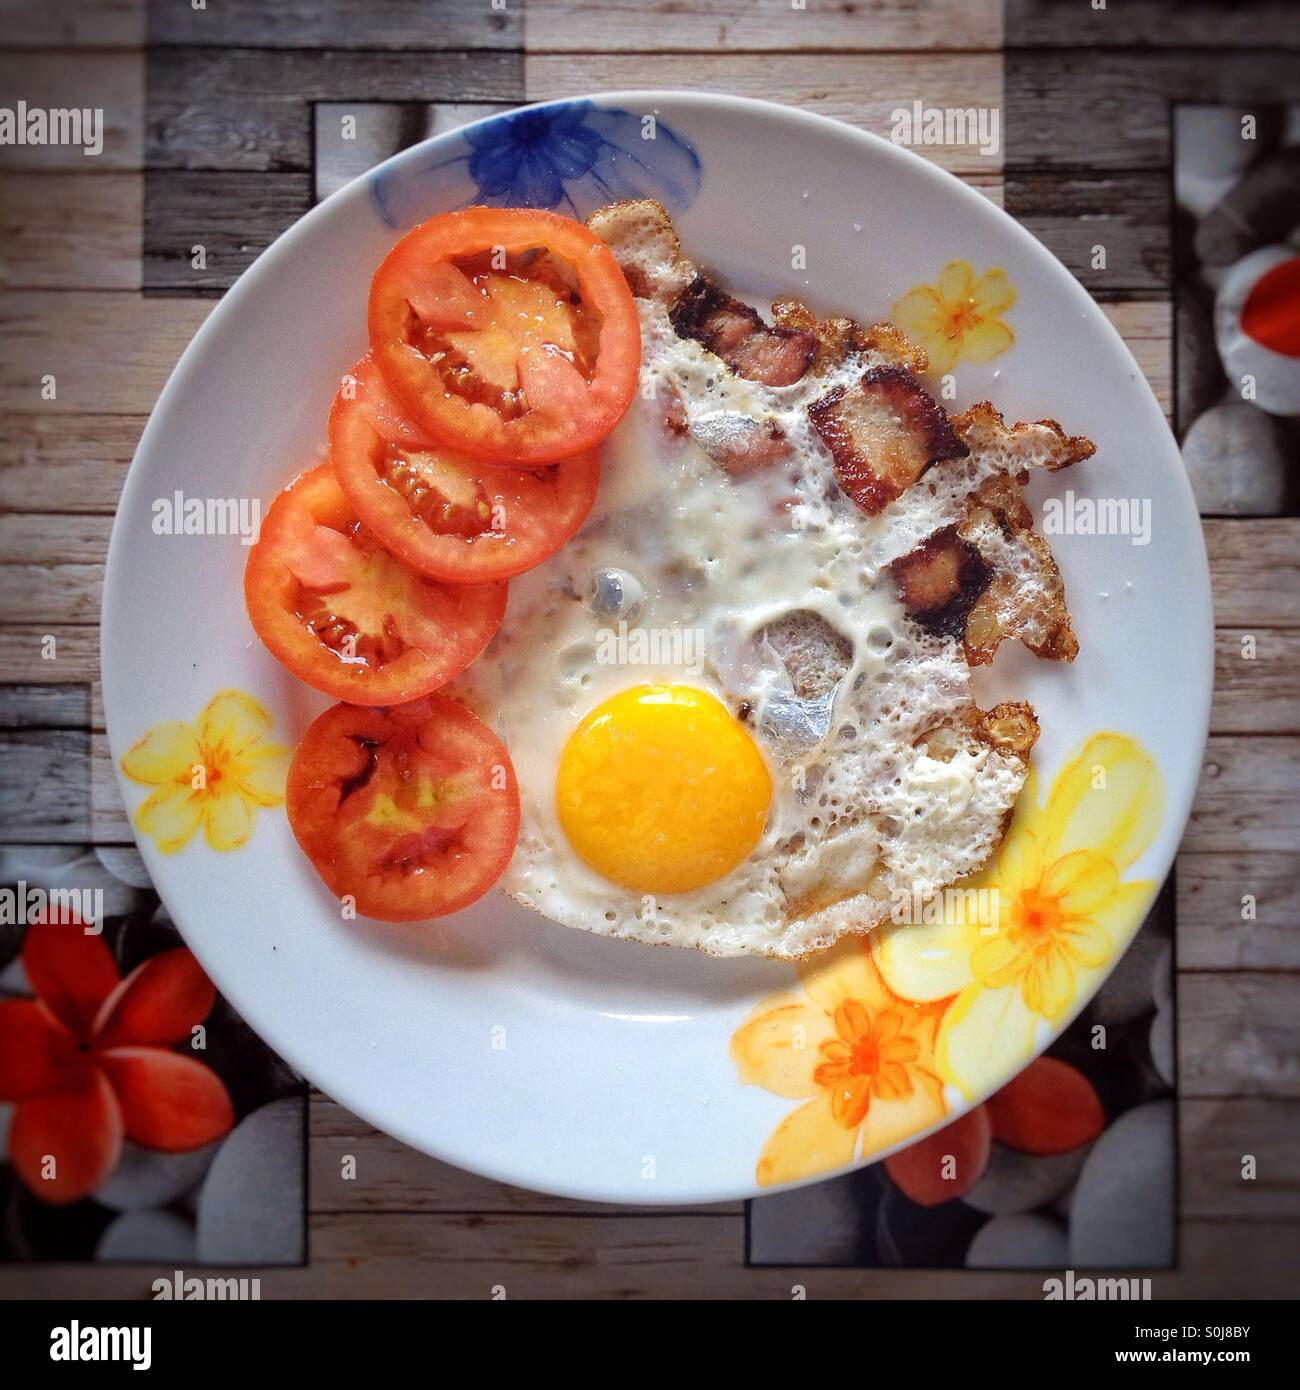 Huevo frito luppolino y tomates Imagen De Stock